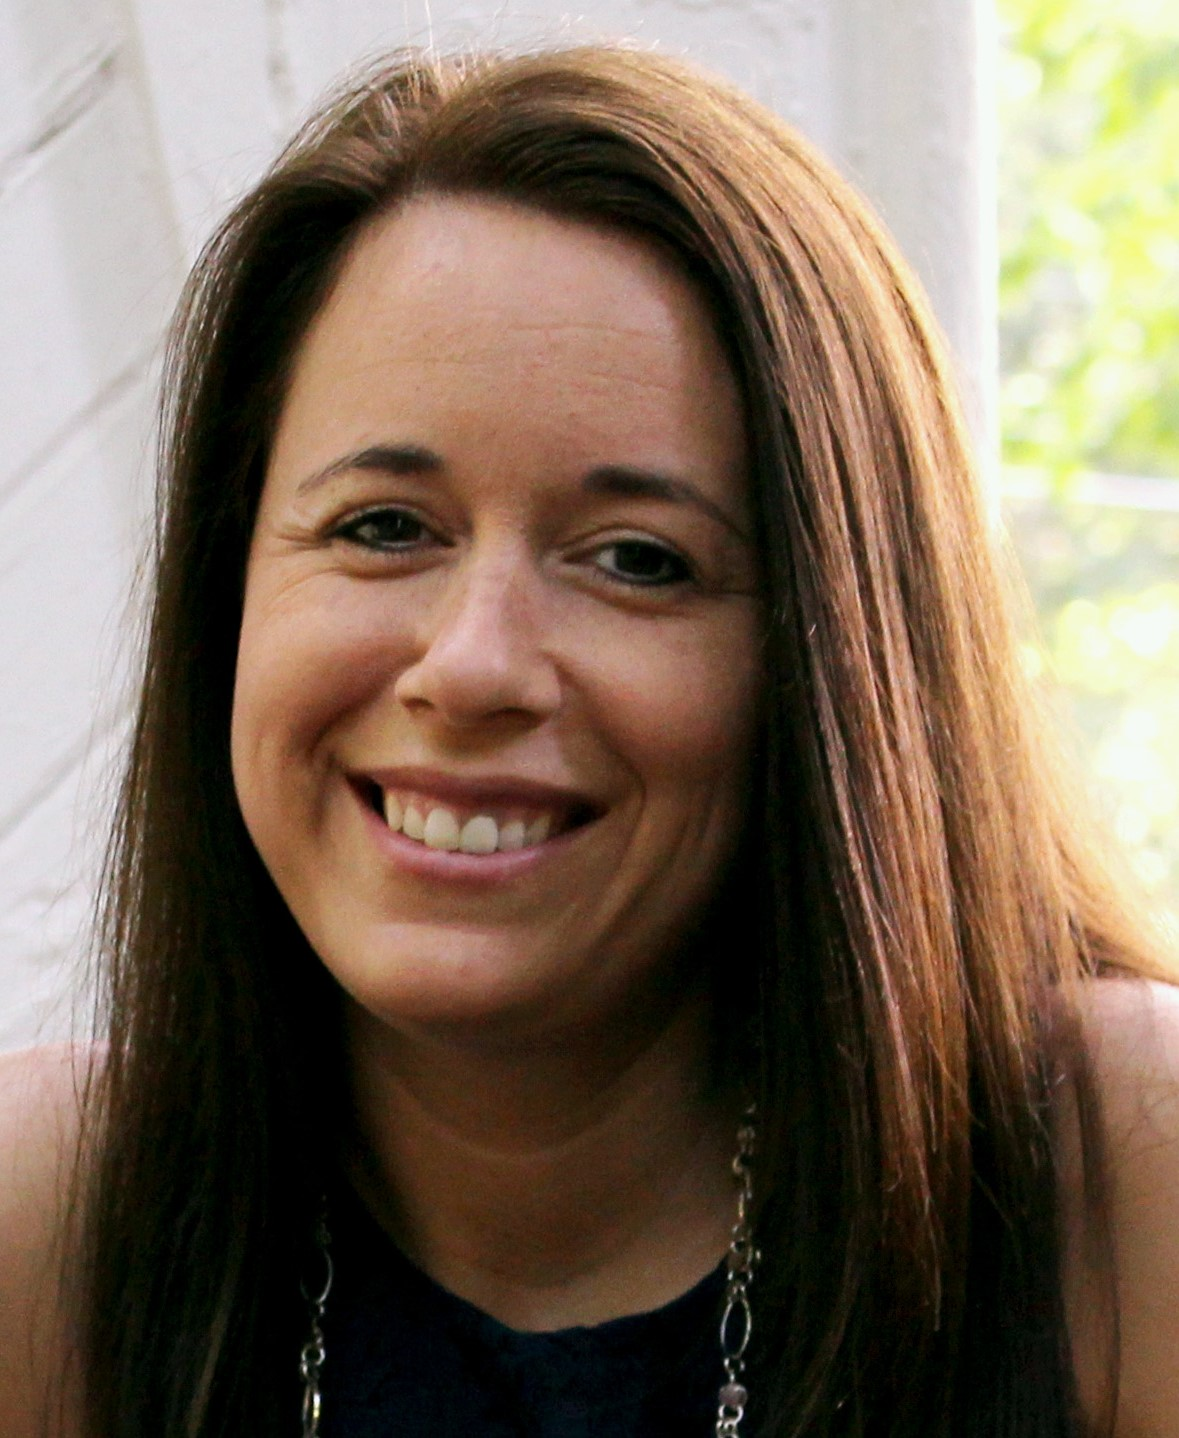 Melissa Knowland